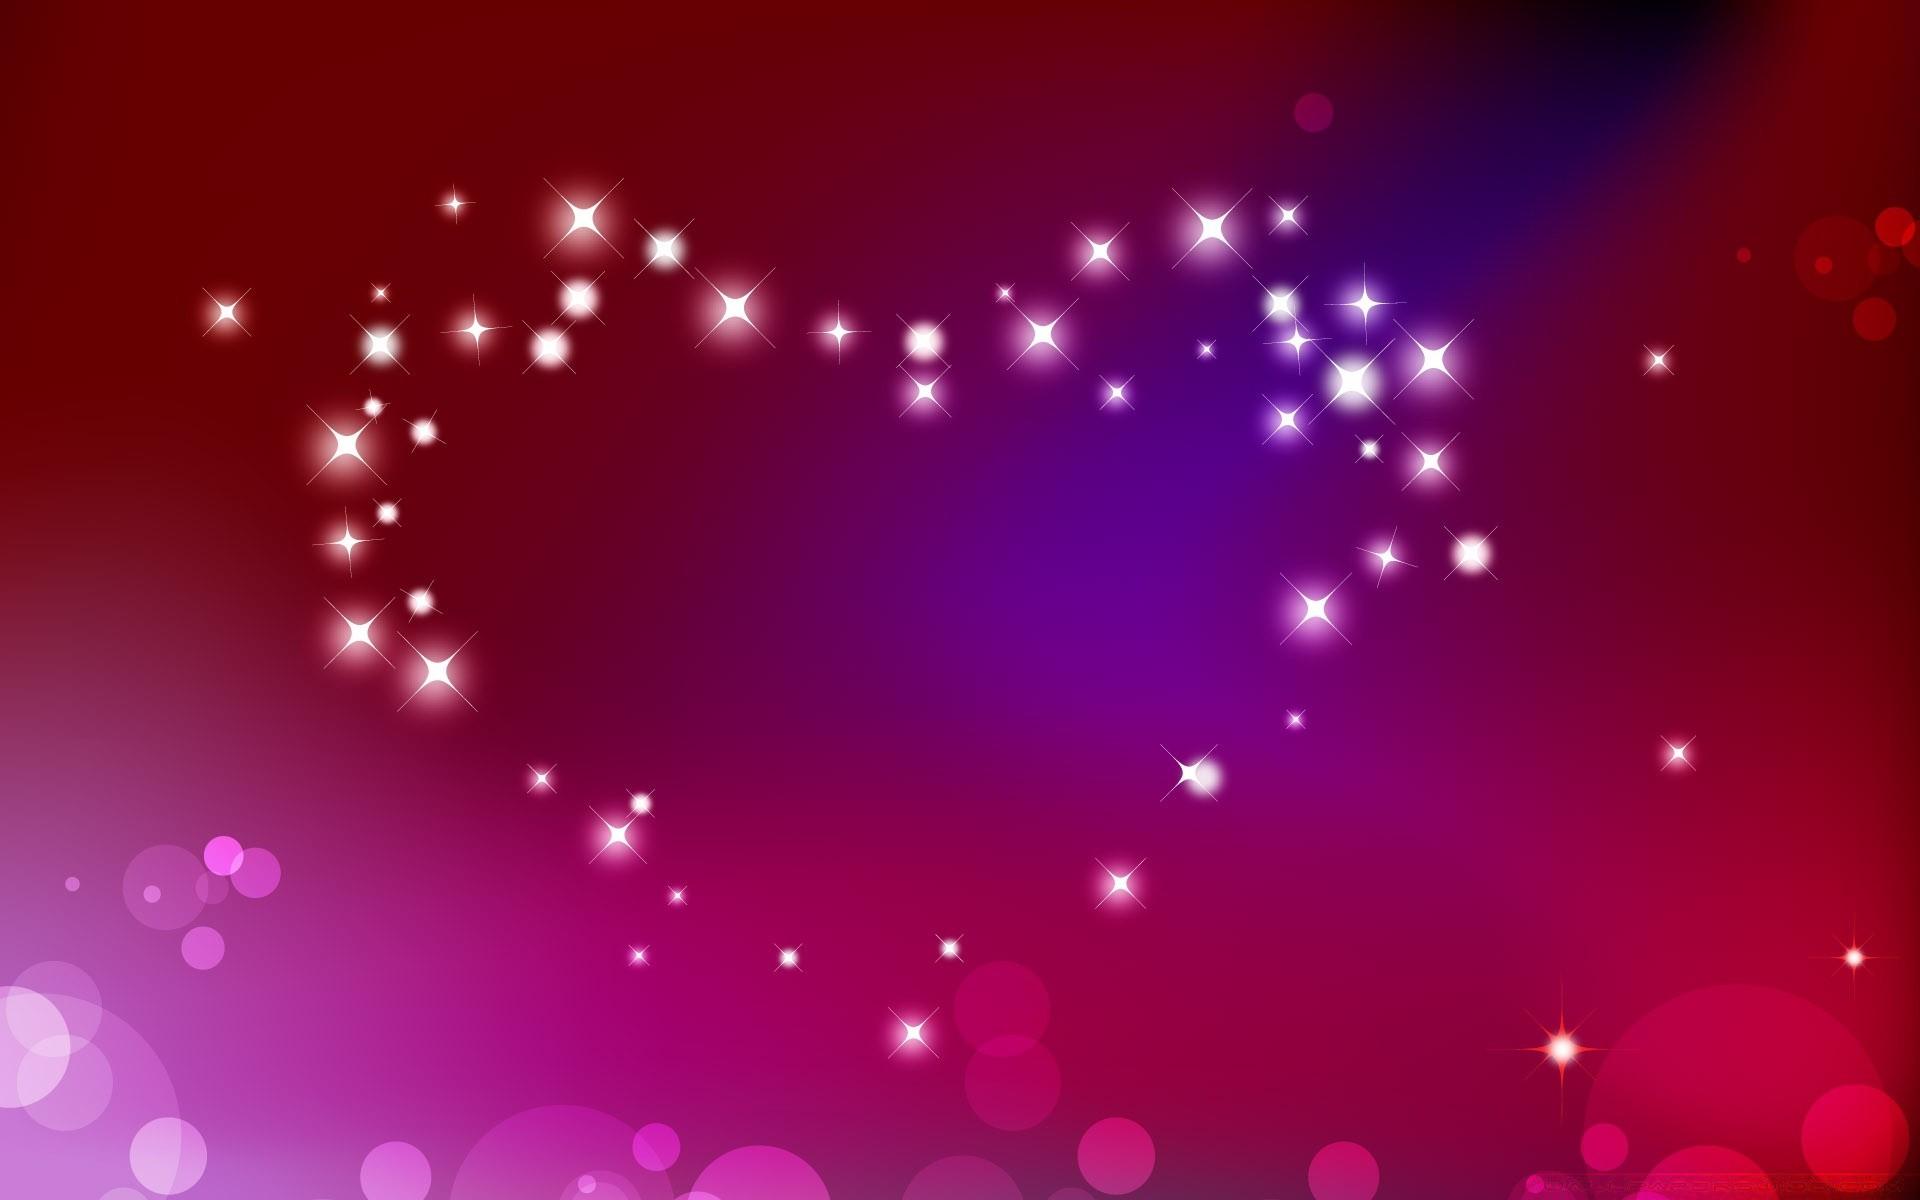 Открытки днем, картинки для фотошопа любовь романтика